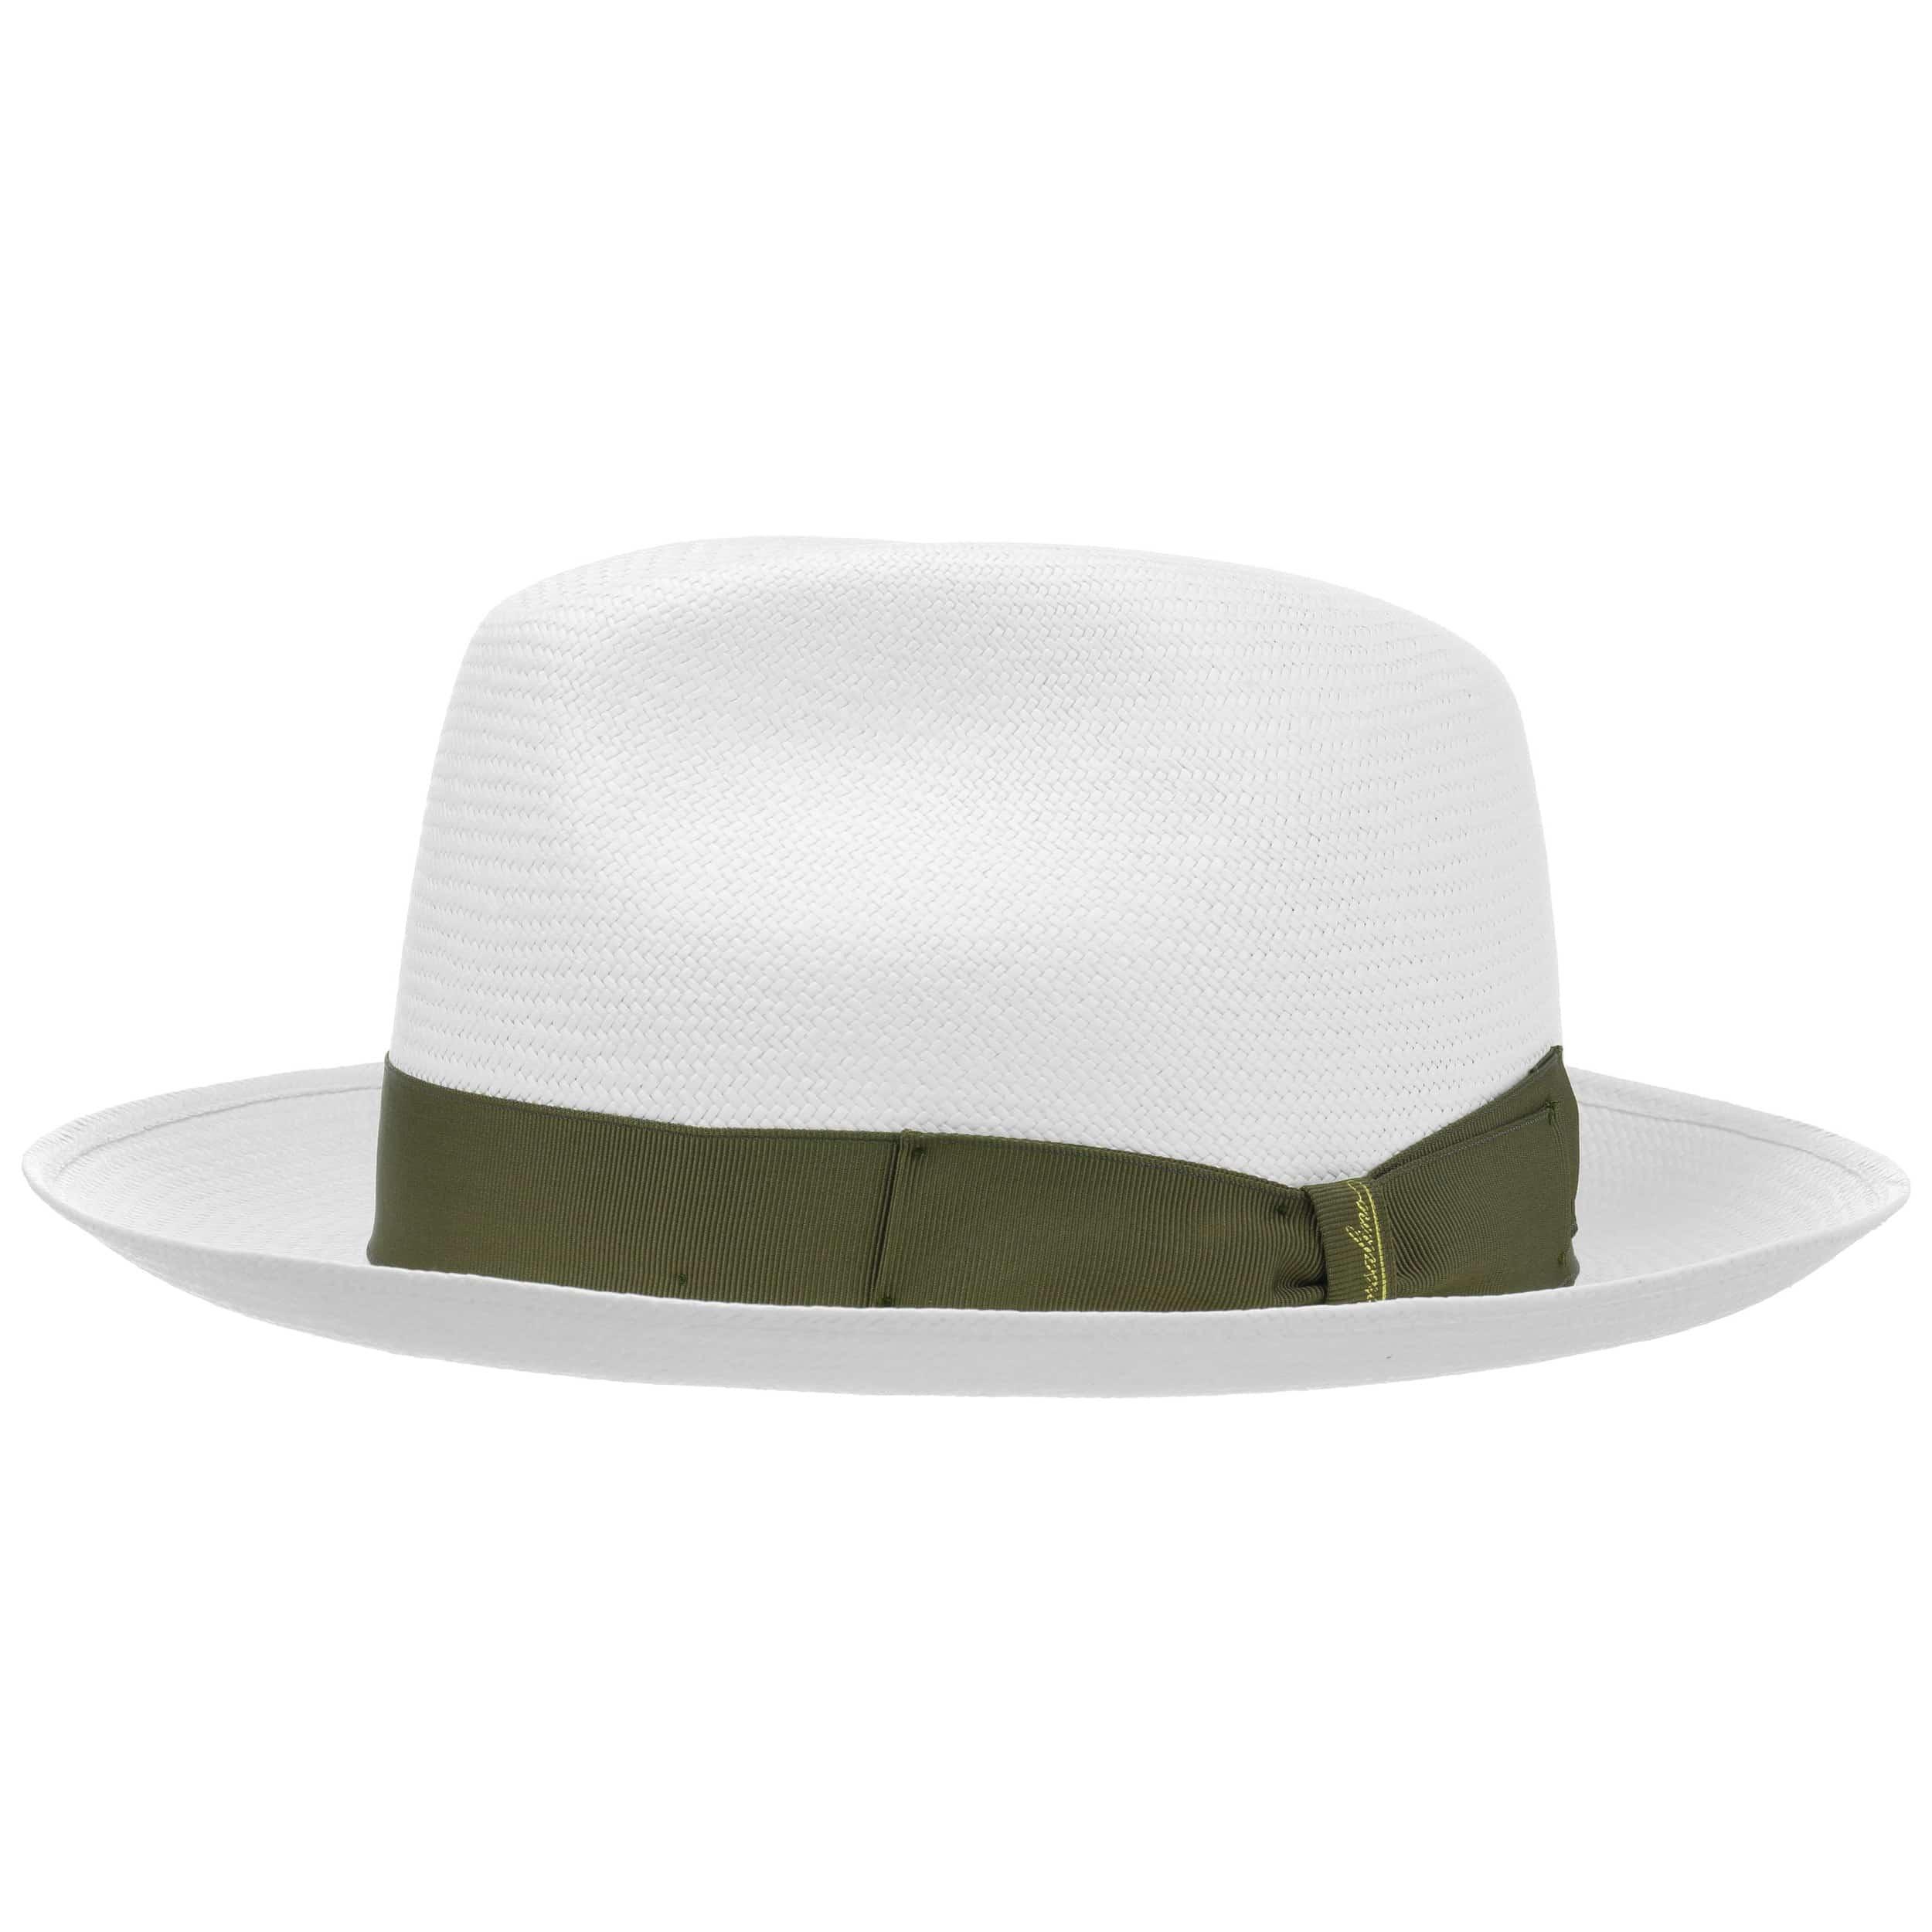 Sombrero Panamá Green Small by Borsalino - Sombreros - sombreroshop.es 66e87062aa6